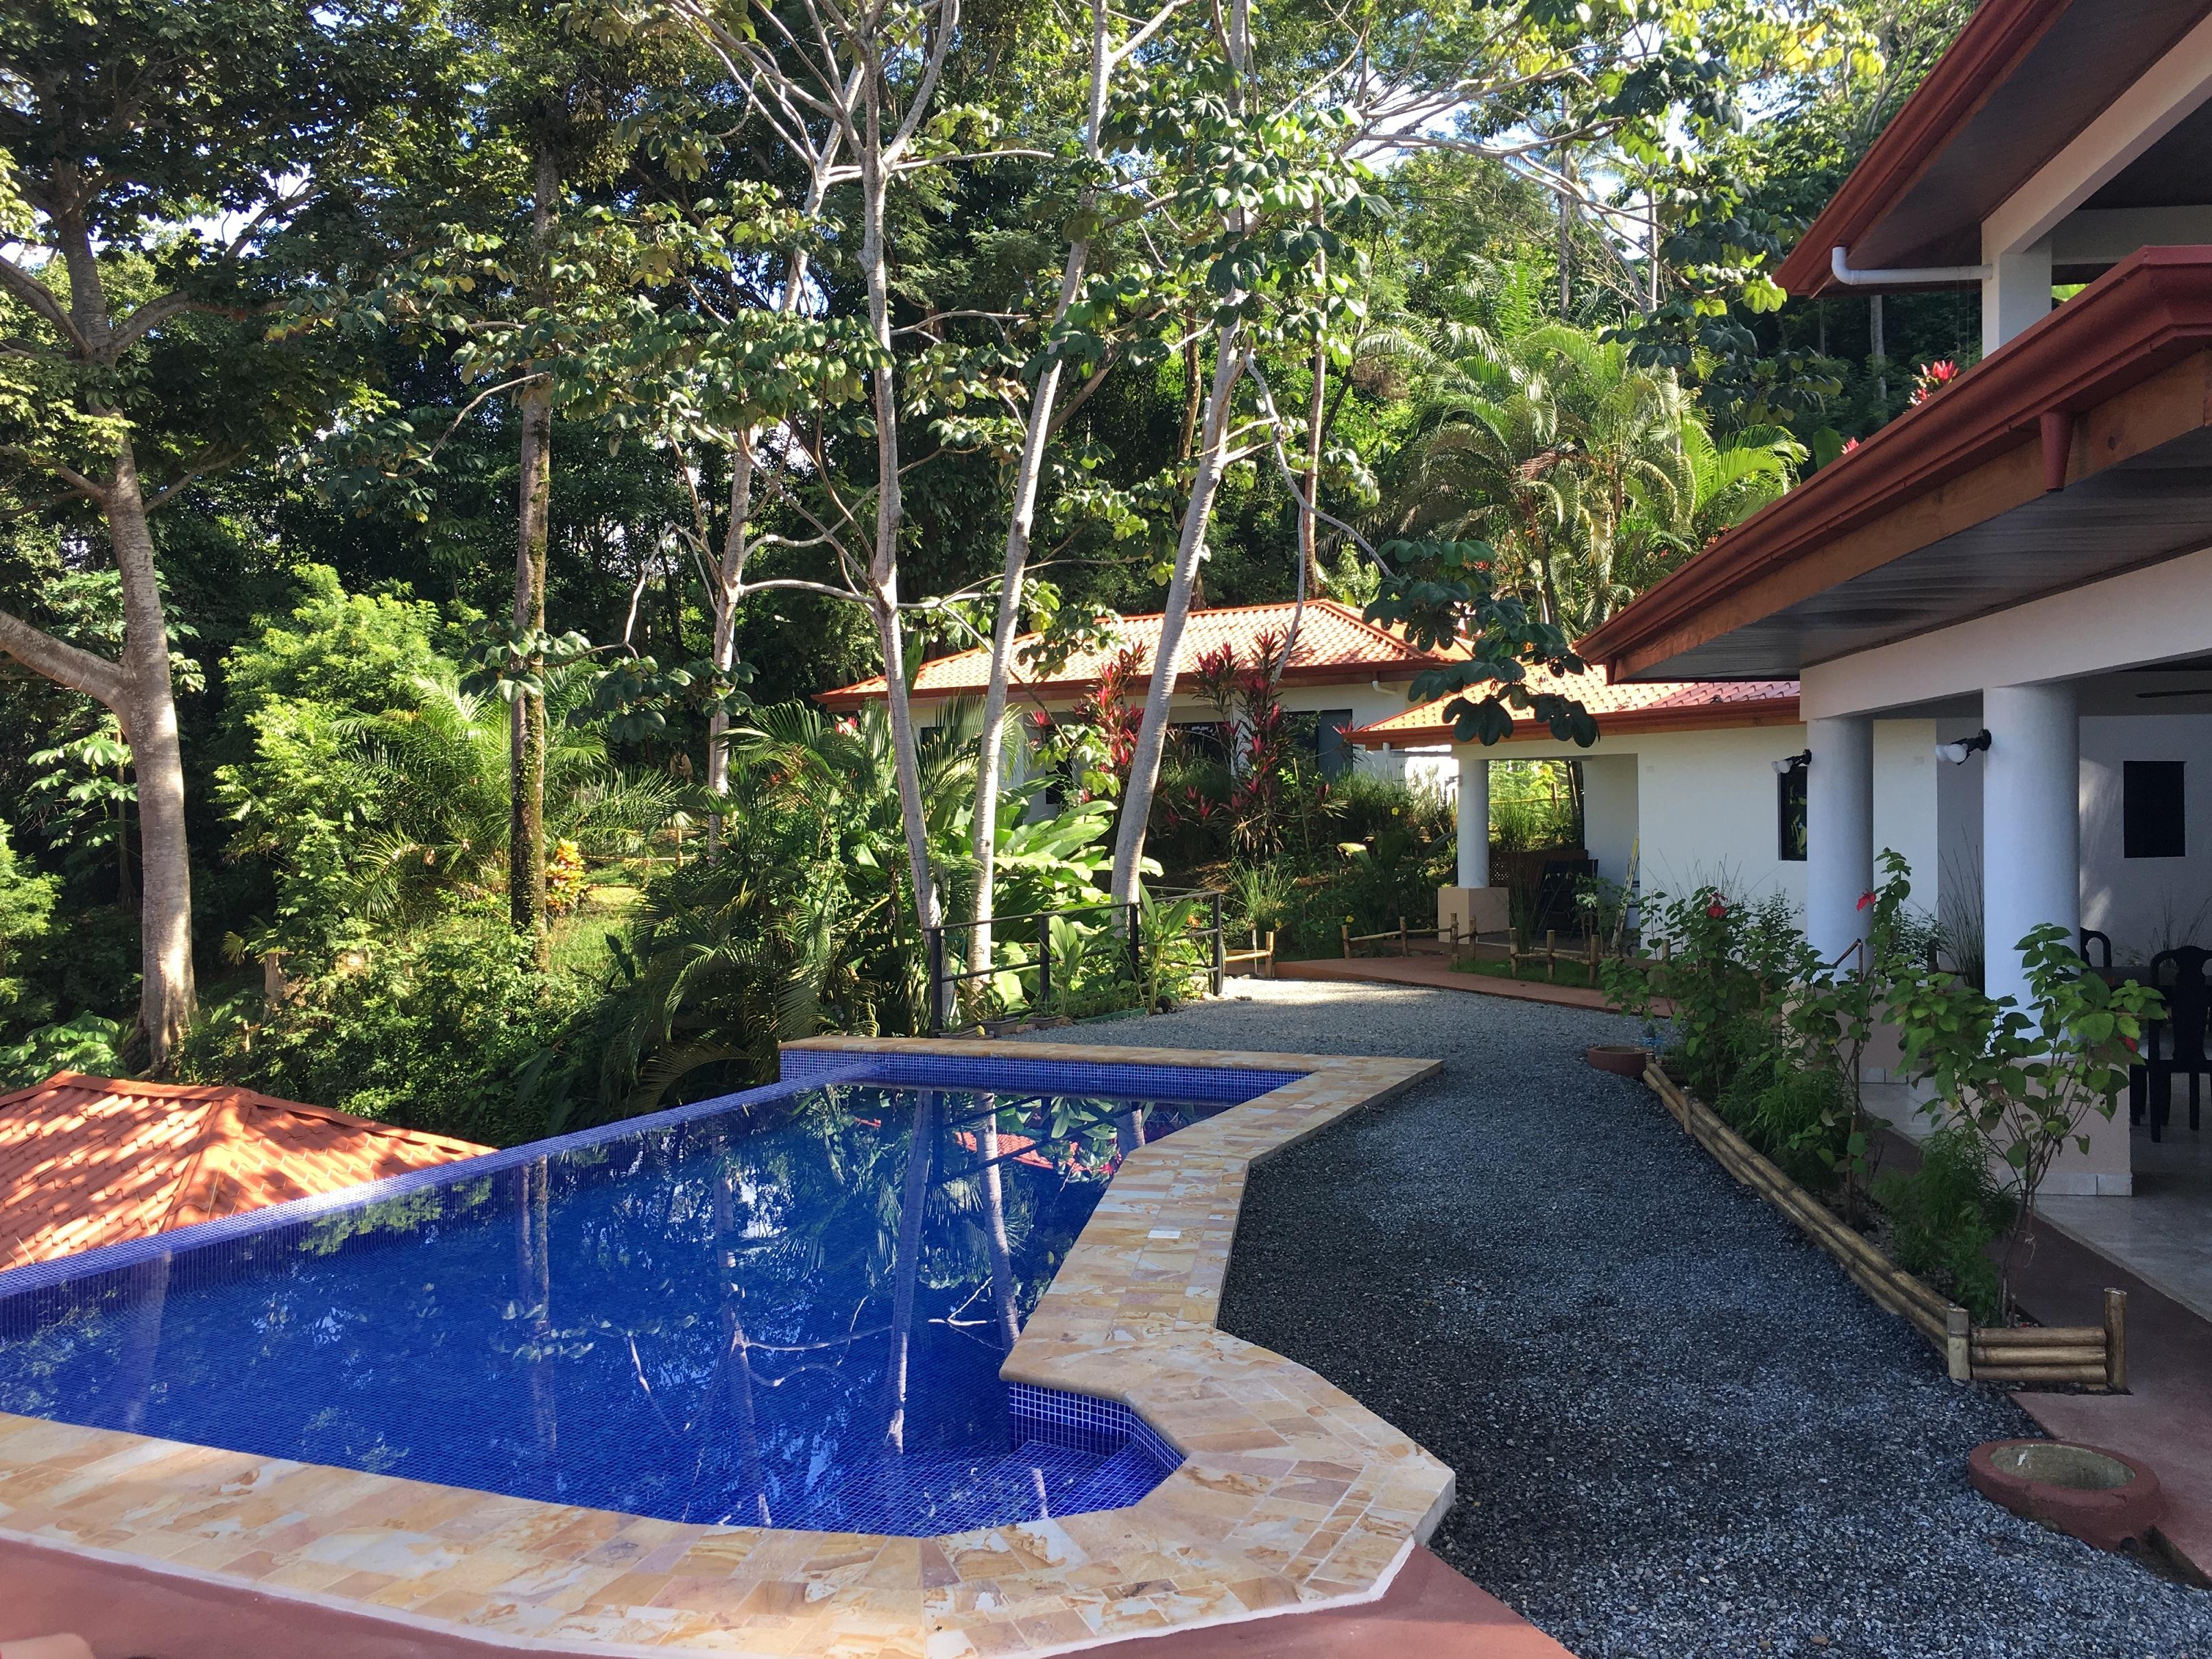 Hatillo-Costa-Rica-property-costaricarealestateHAT087-10.jpg